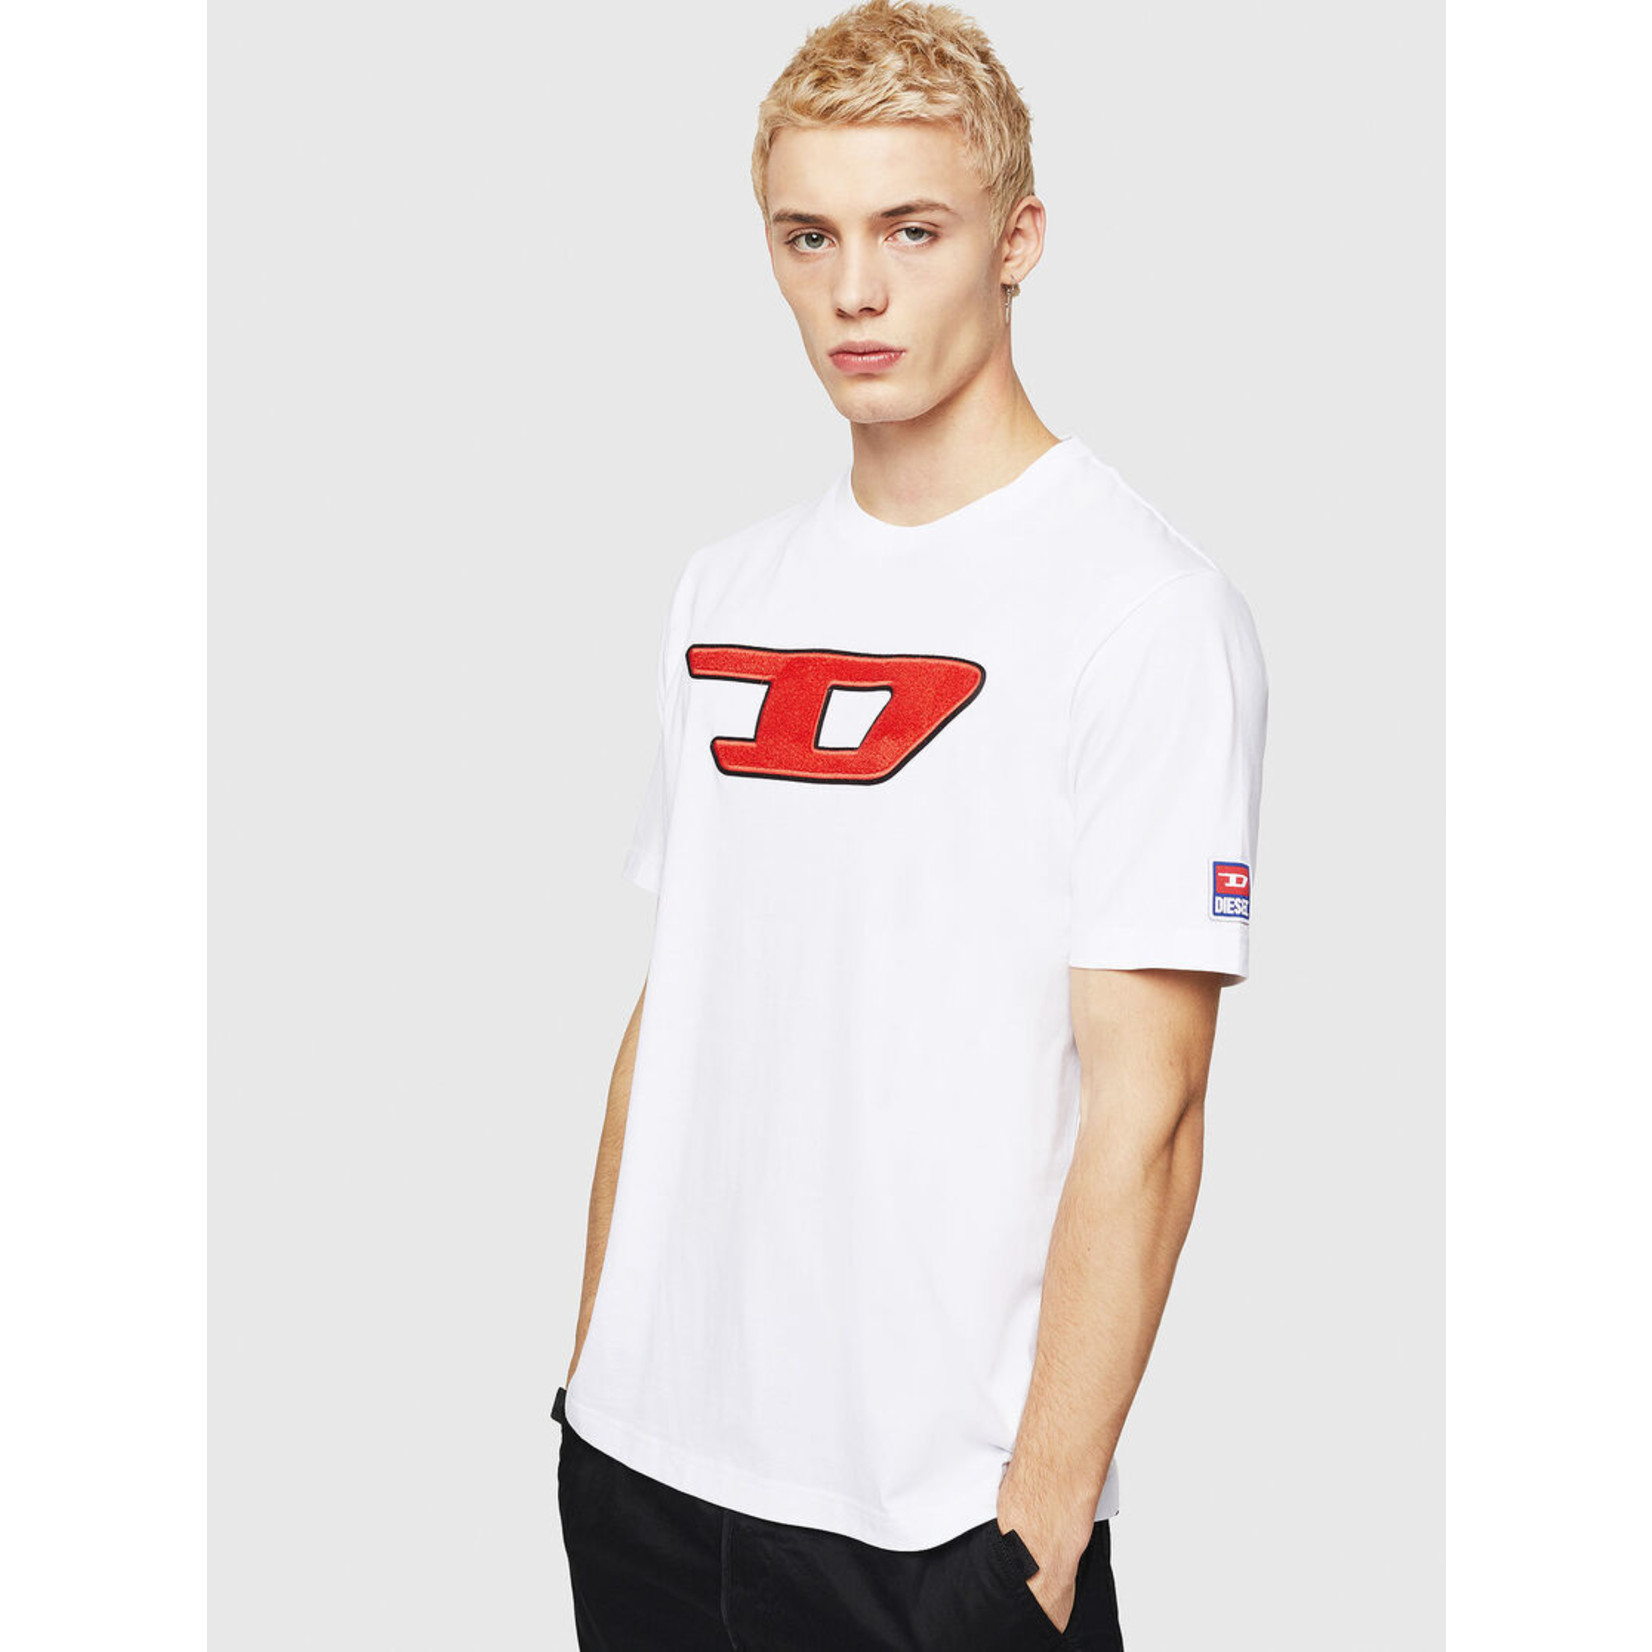 DIESEL DIESEL T-SHIRT T-JUST DIVISION D - WHITE